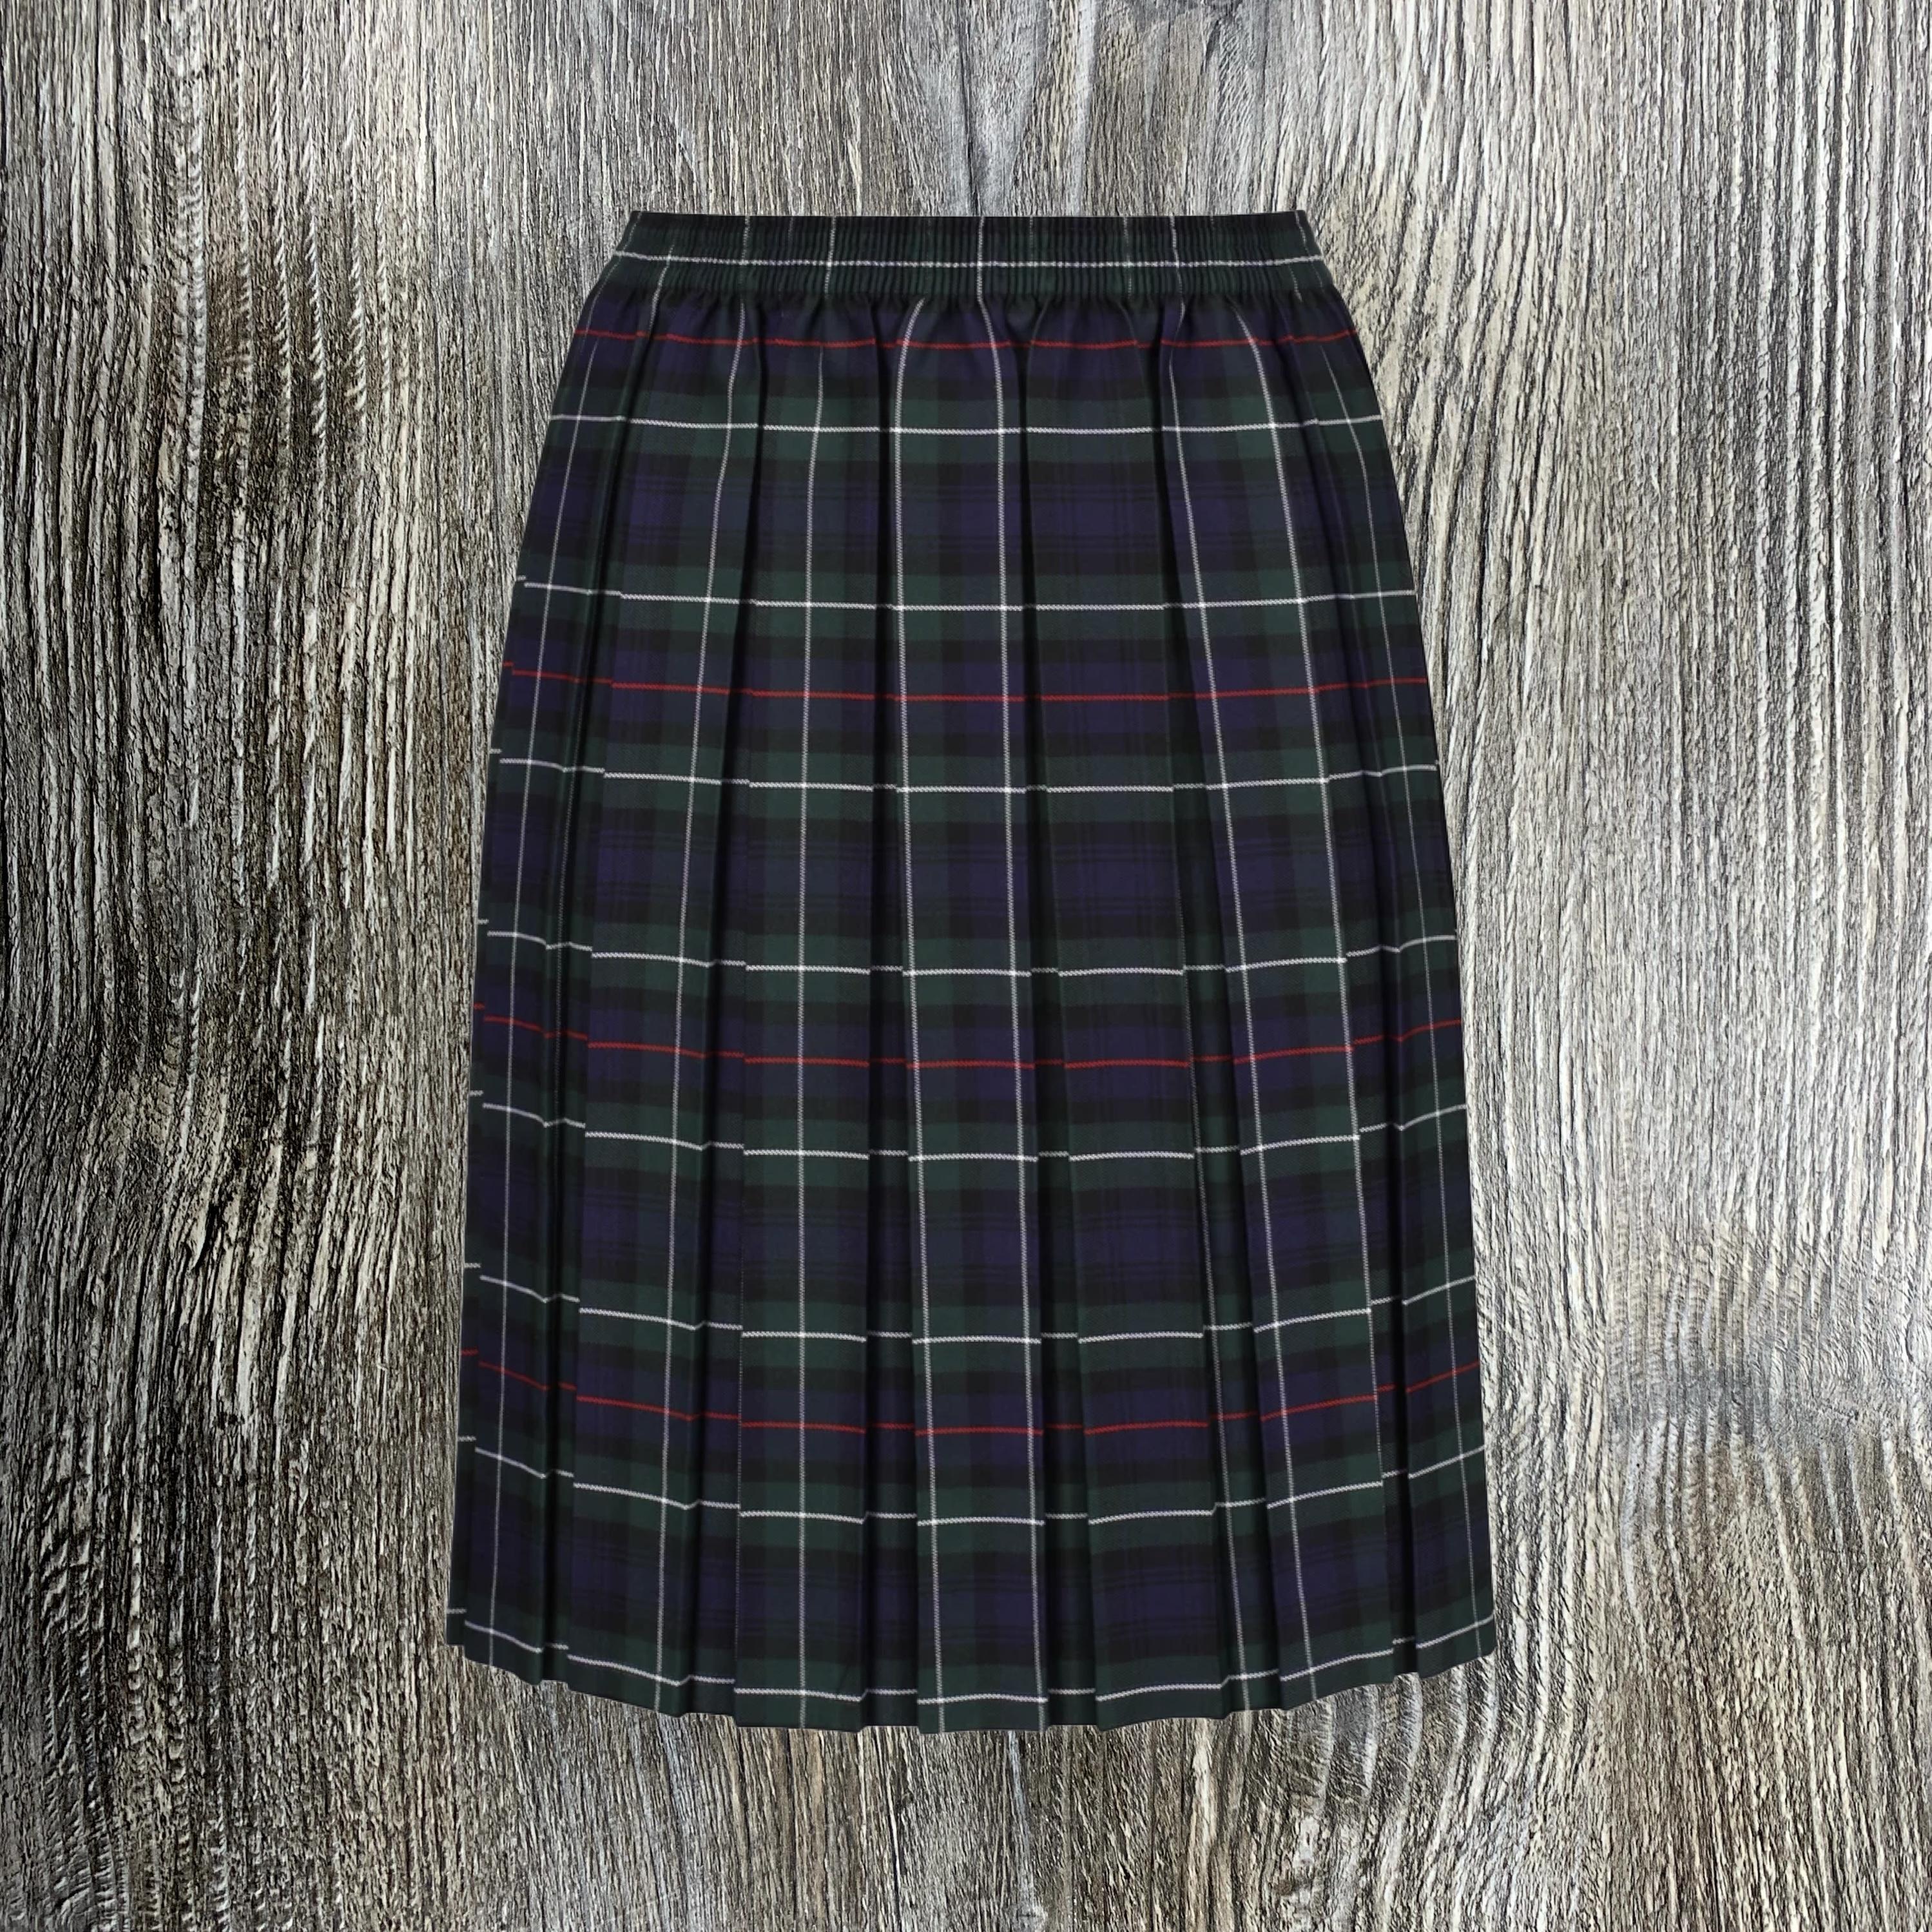 Barrow Tartan Skirt